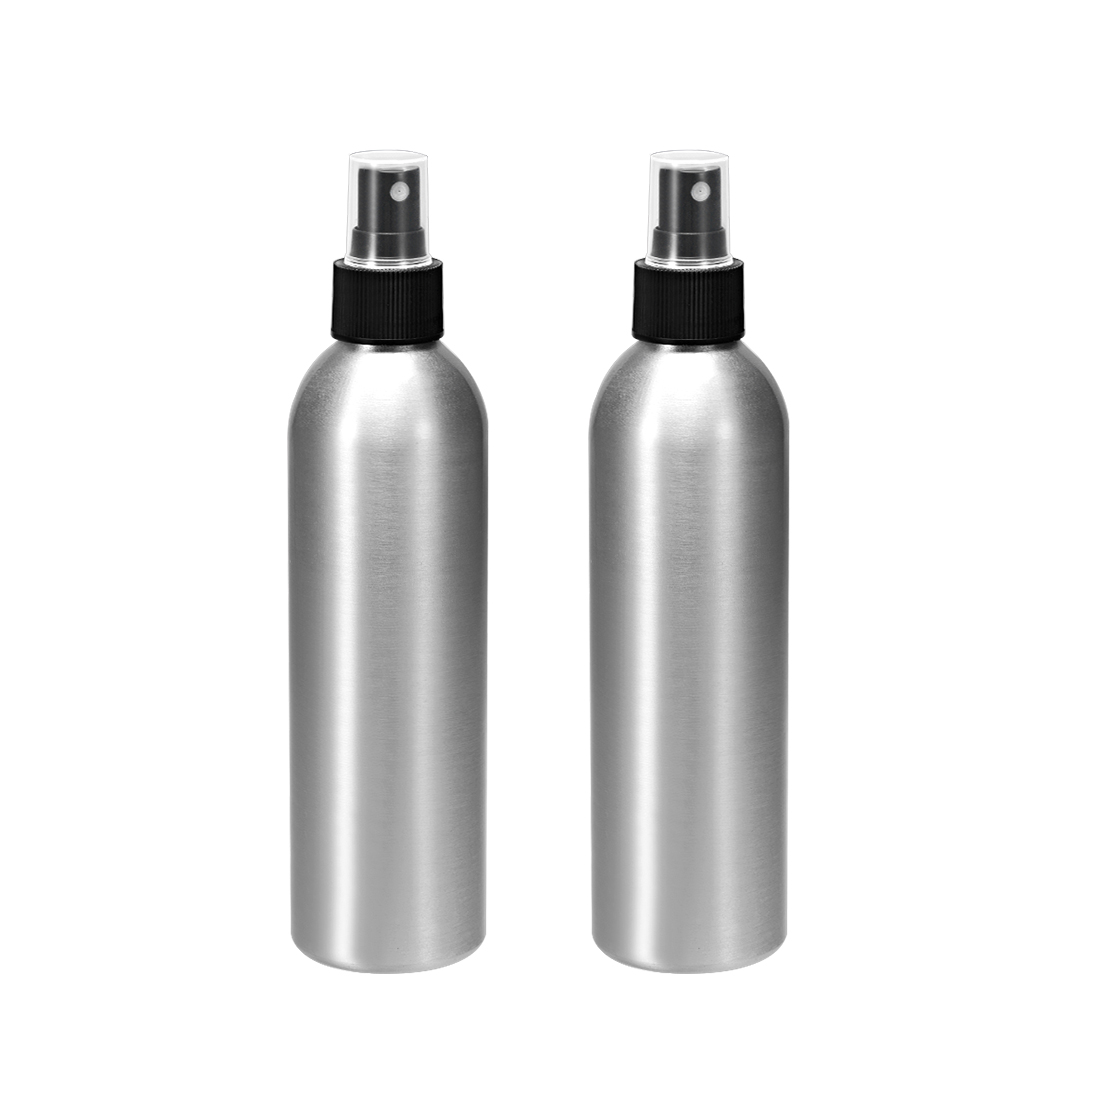 2pcs 8.5oz/250ml Aluminium Spray Bottle with Black Sprayer, Refillable Container